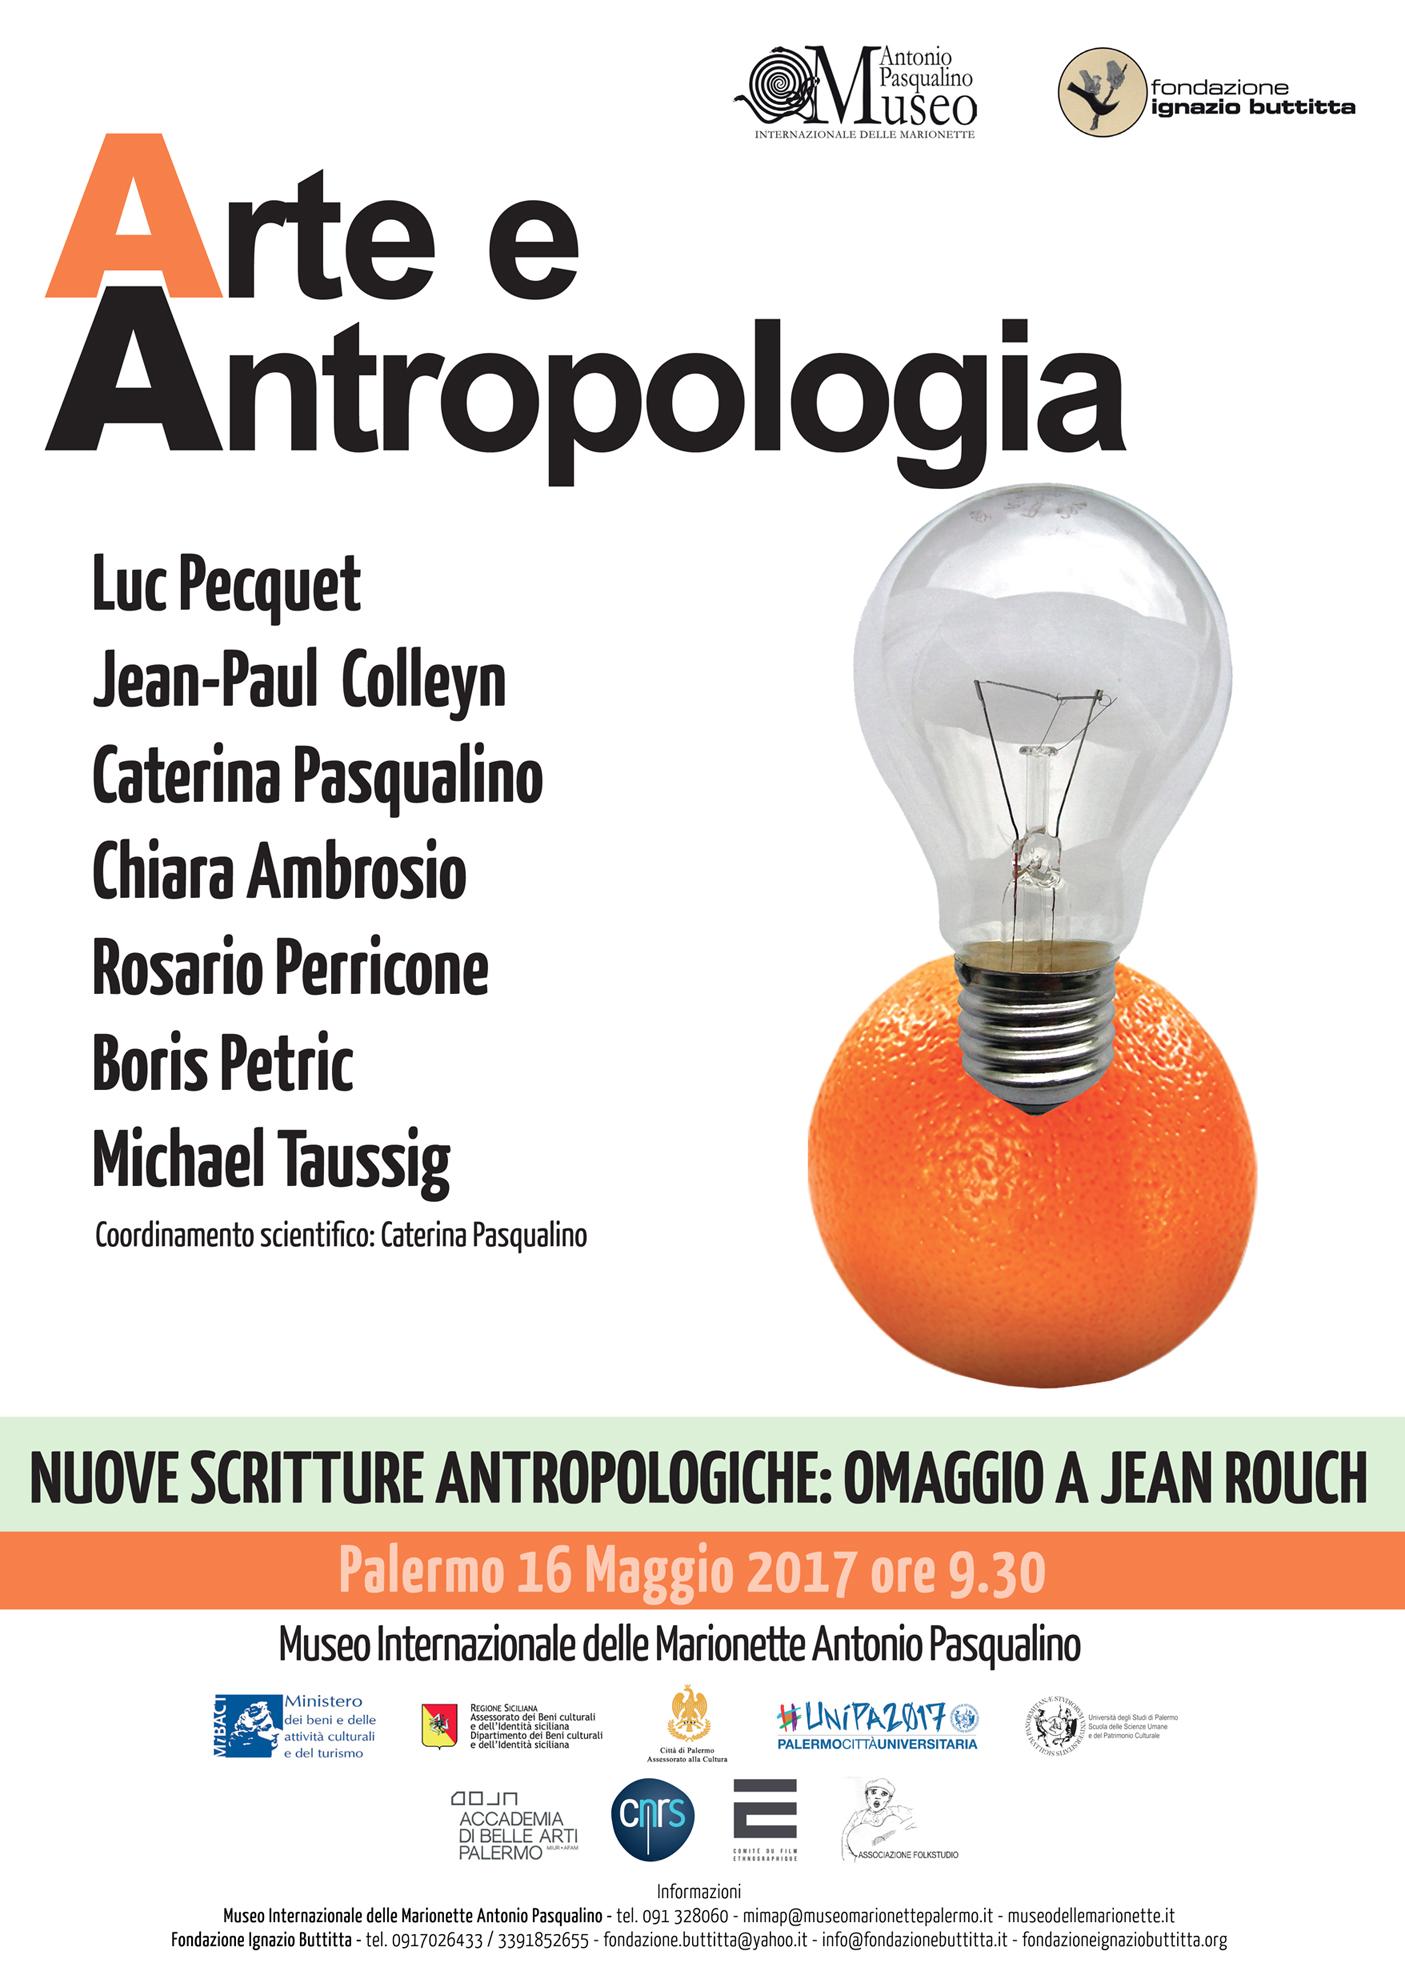 ArteAntropologia_LOCANDINA_A3_STAMPA